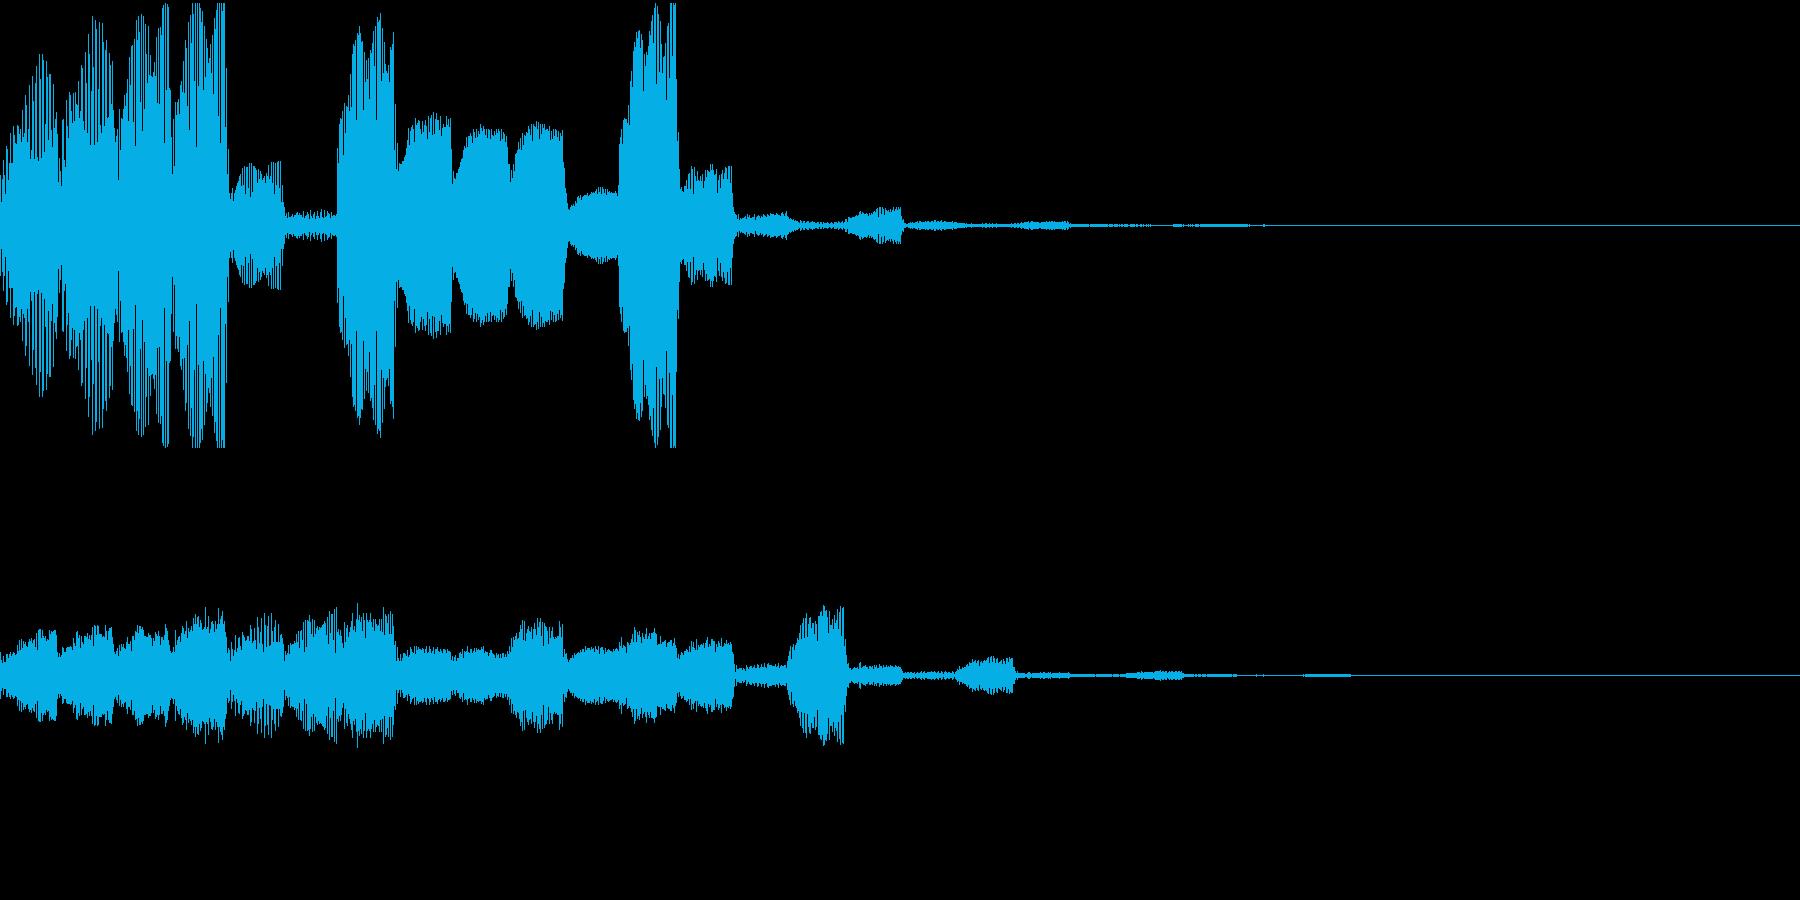 RPG 進化 特技 回復 魔法 キラキラの再生済みの波形